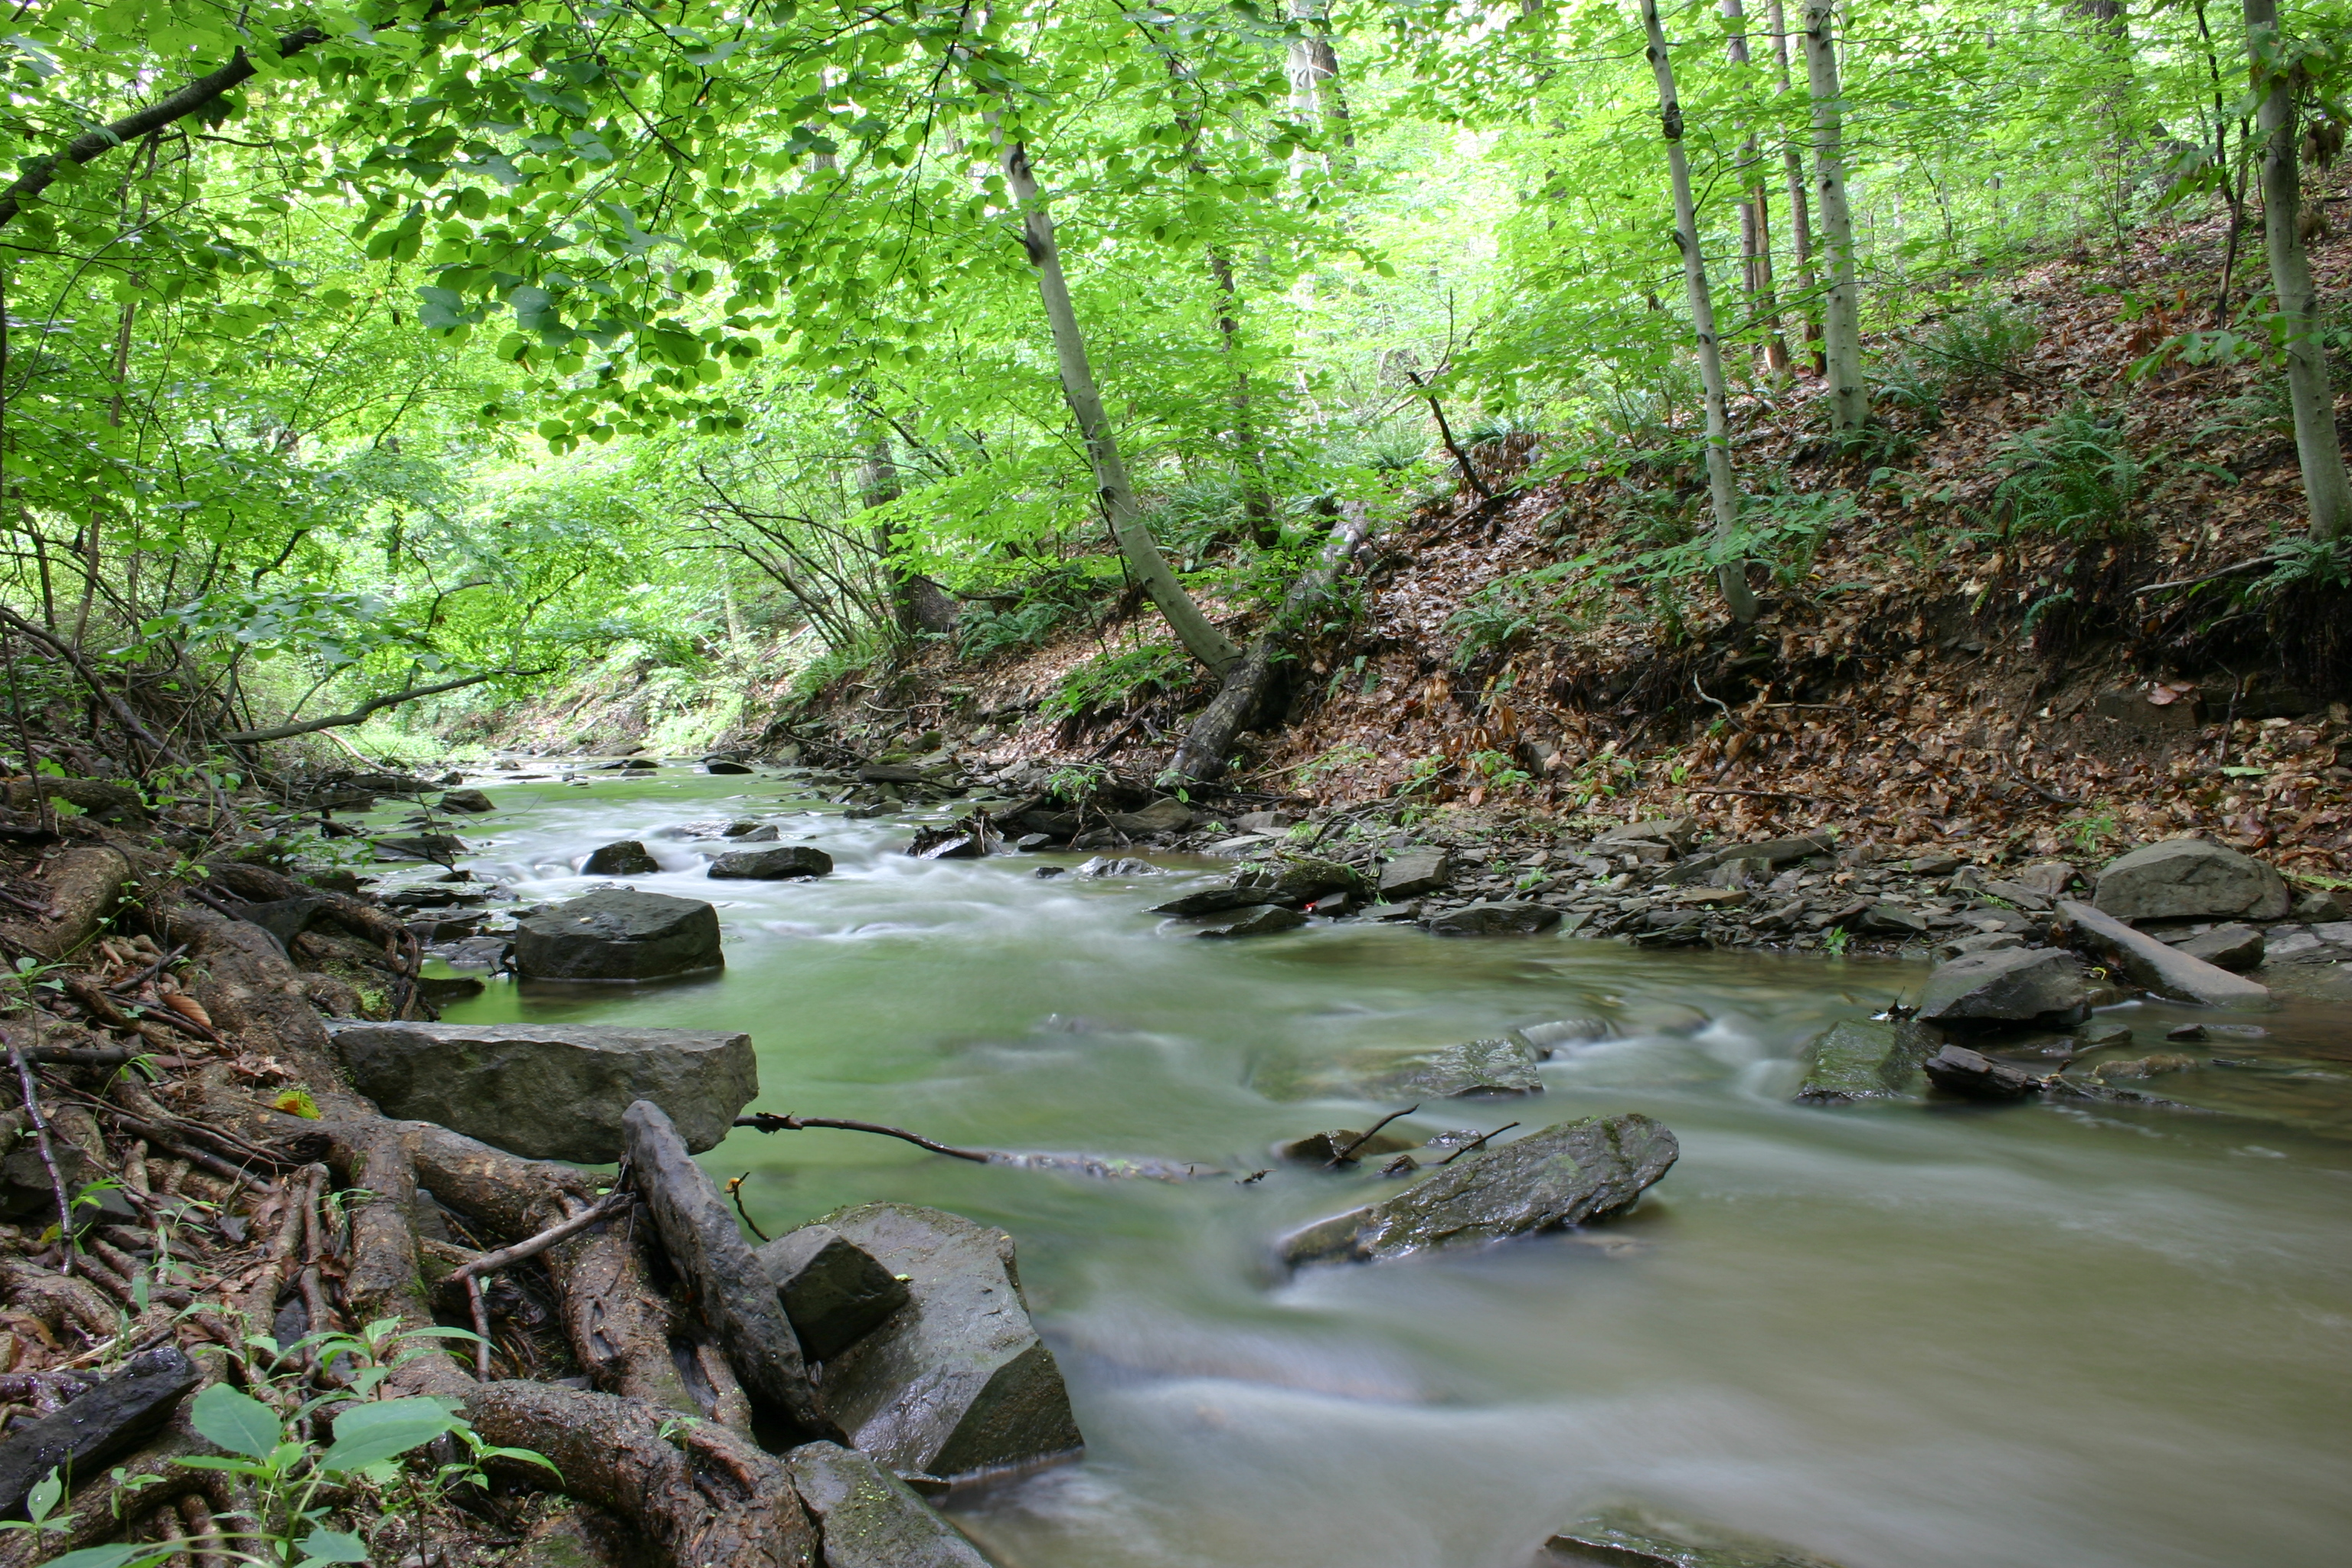 Creek in summer